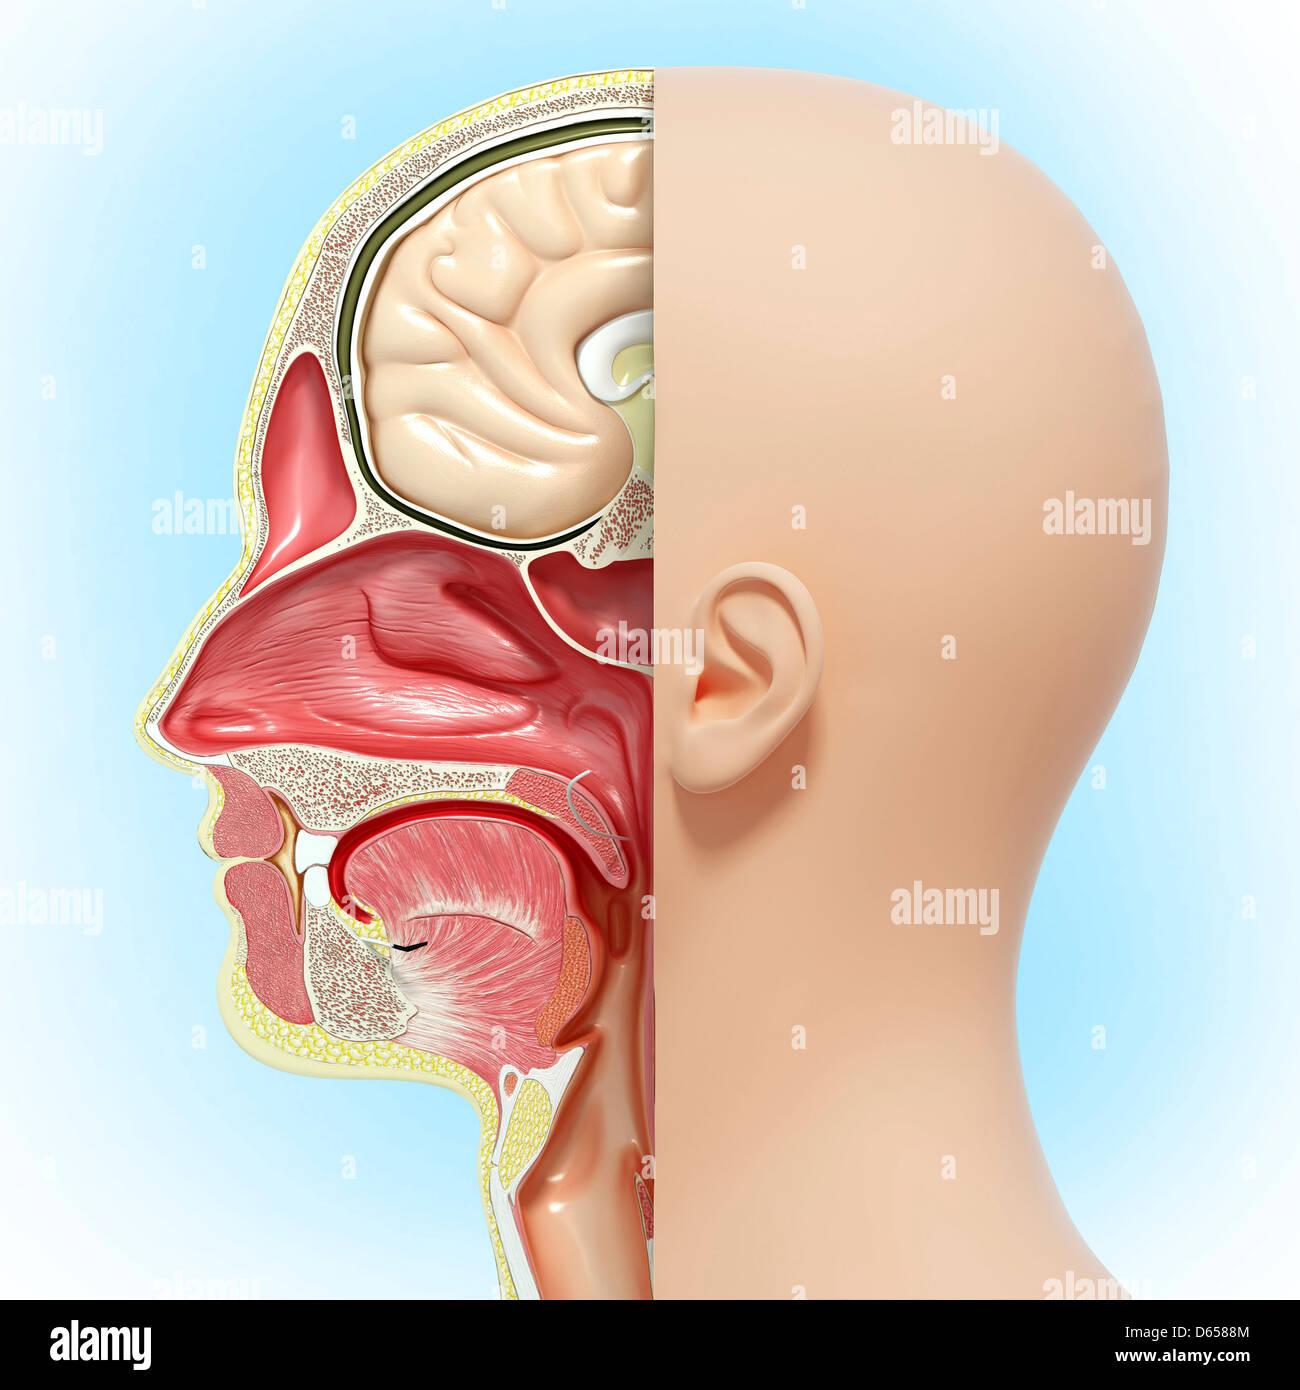 Anatomy Of Human Tongue Stock Photos Anatomy Of Human Tongue Stock